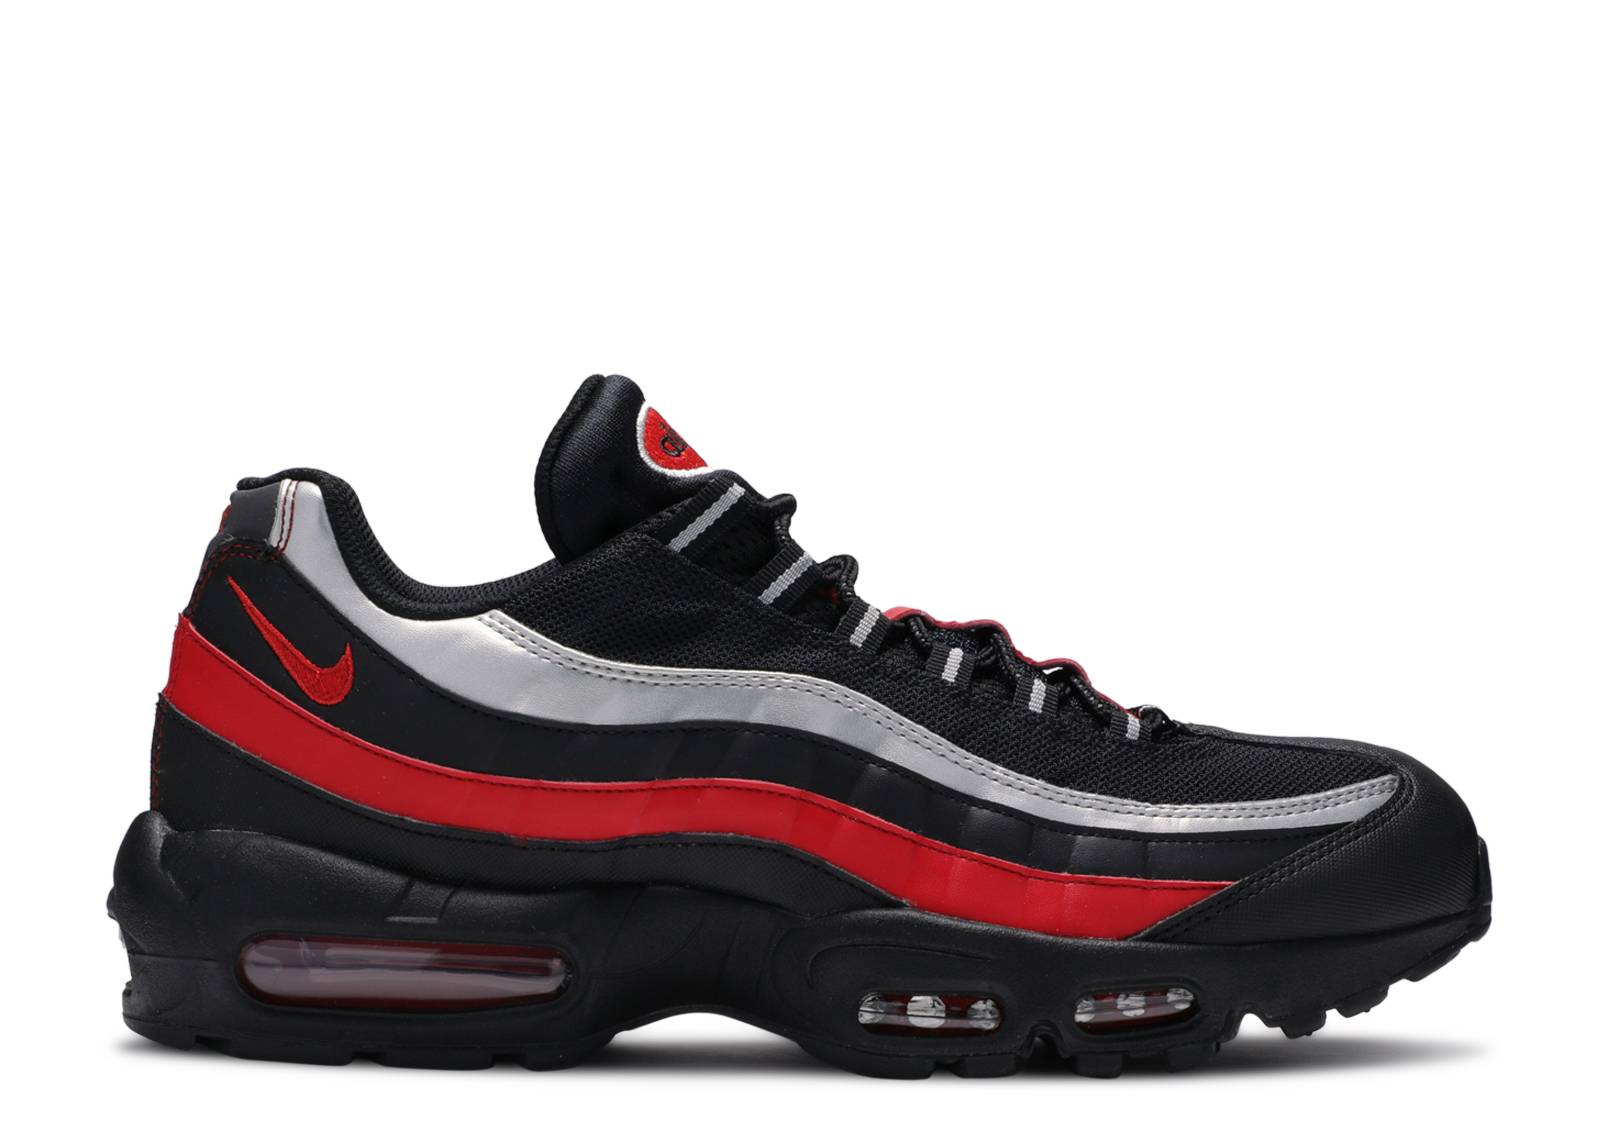 Nike Air Max 95 Essential Black University Red UK 10